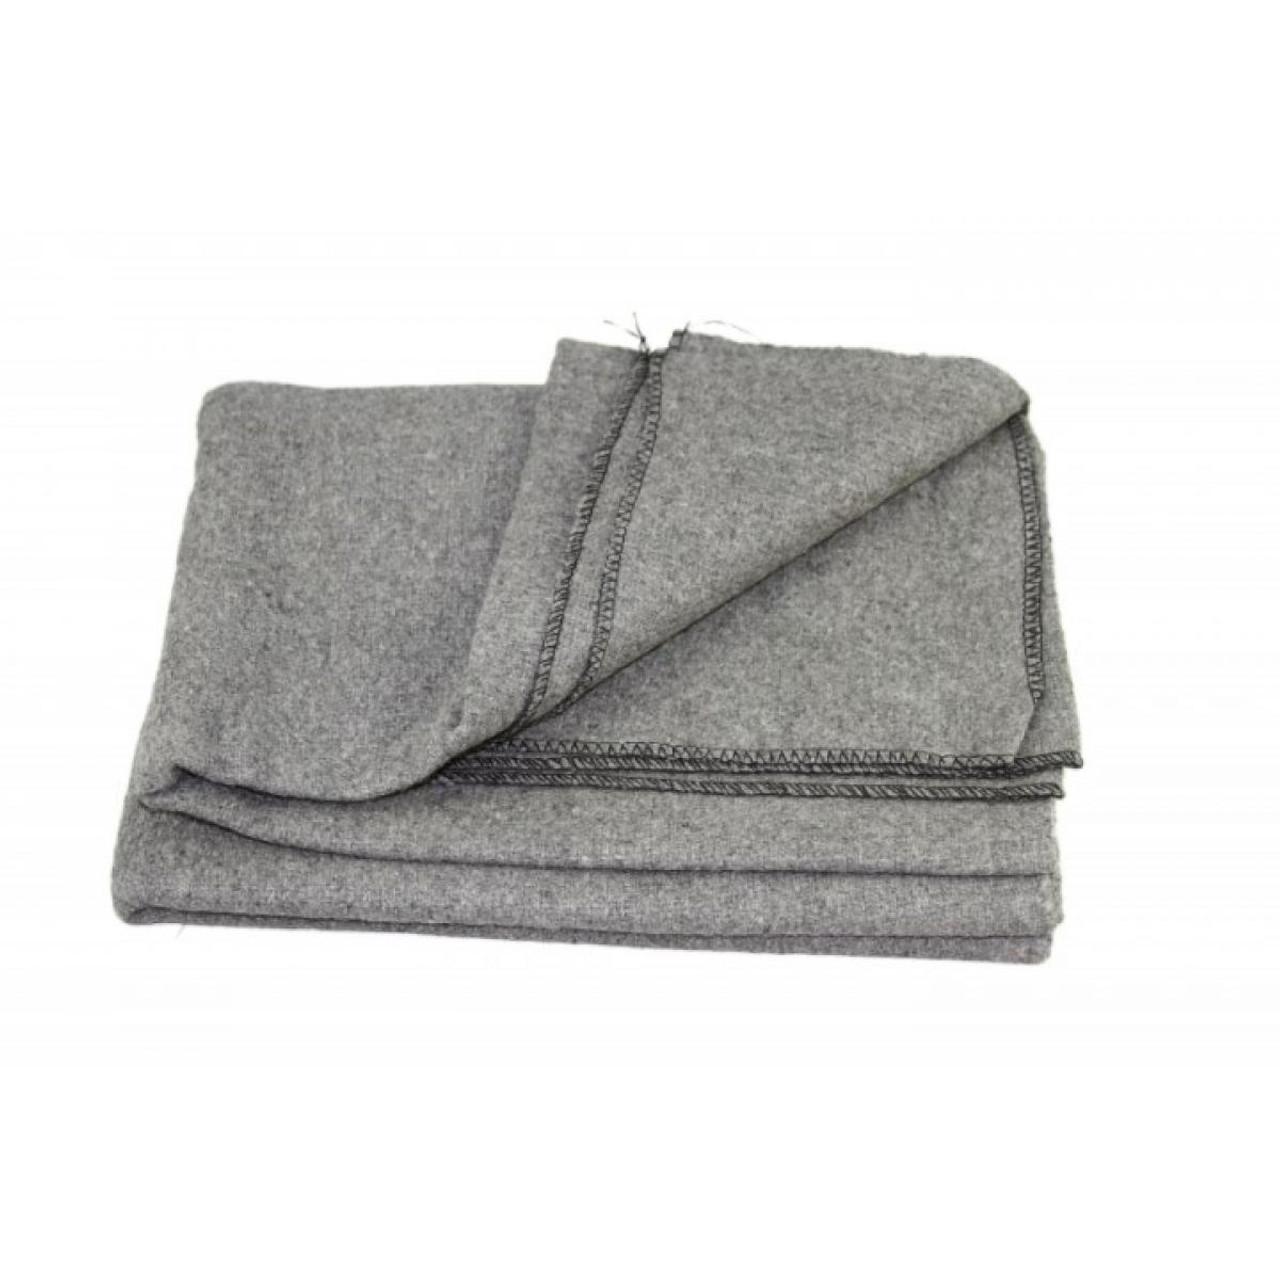 NEW All Purpose Wool Blanket